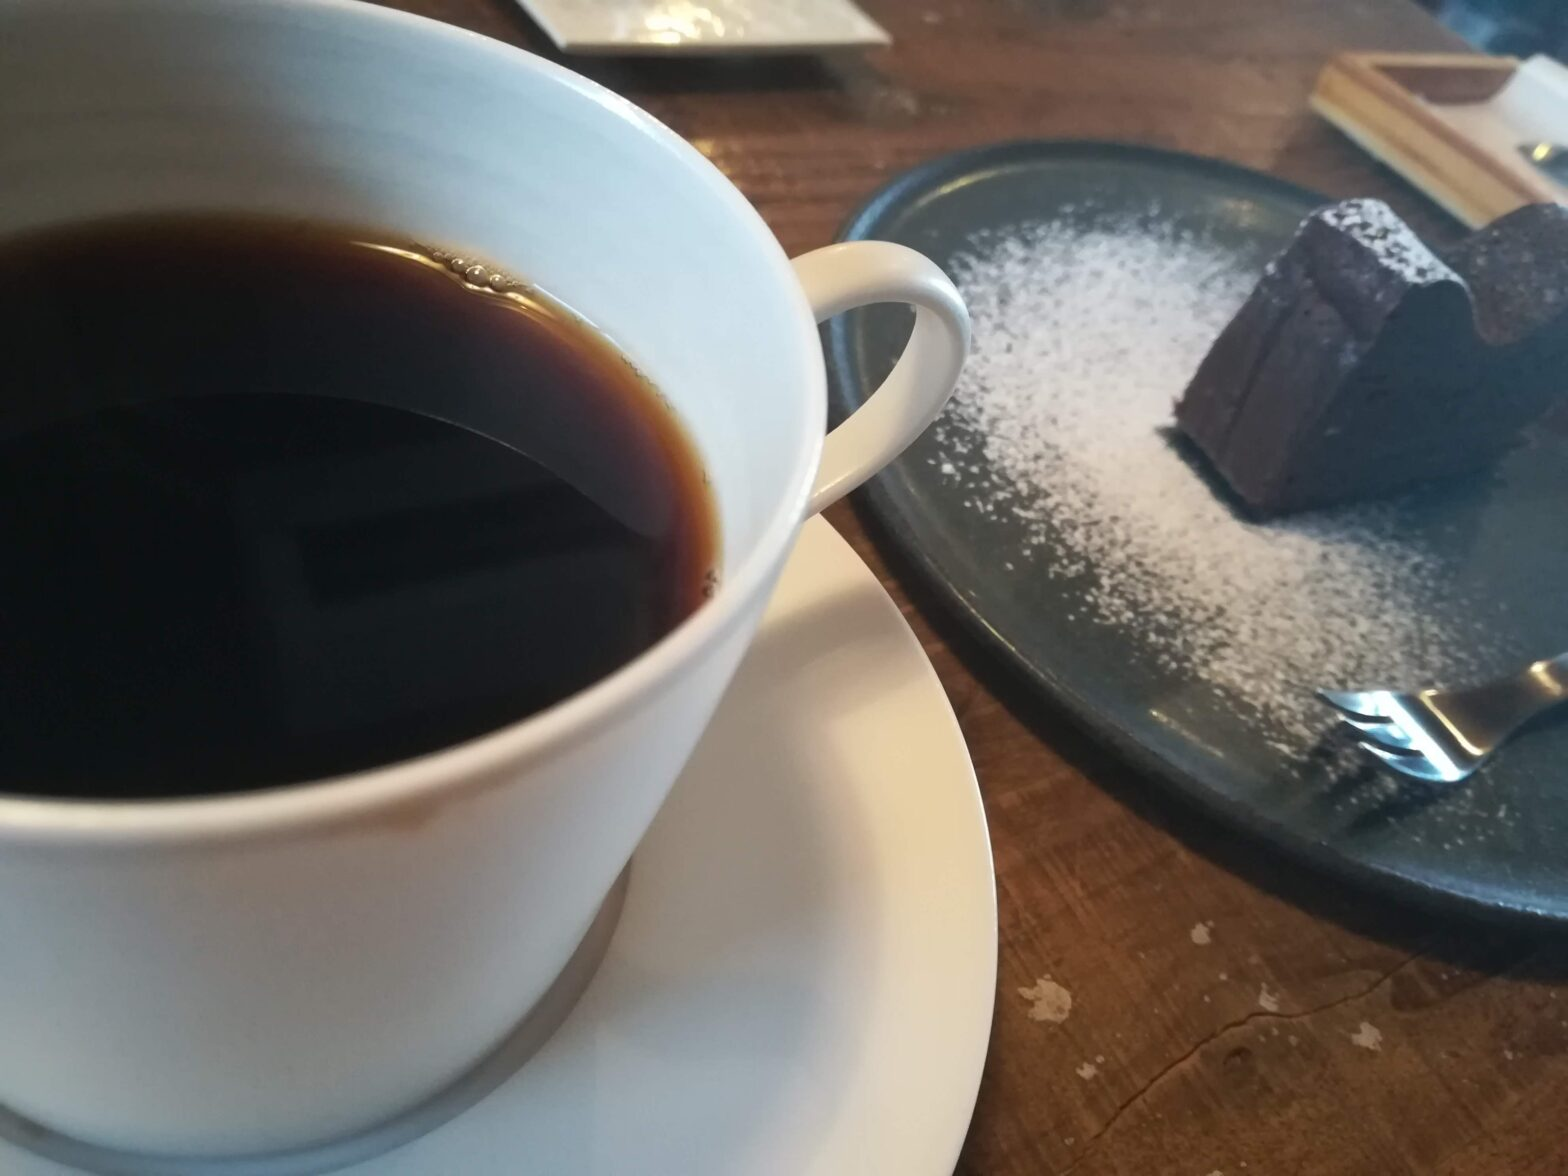 CAFEめがね書房のコーヒーとスイーツ(大紀町の喫茶店)